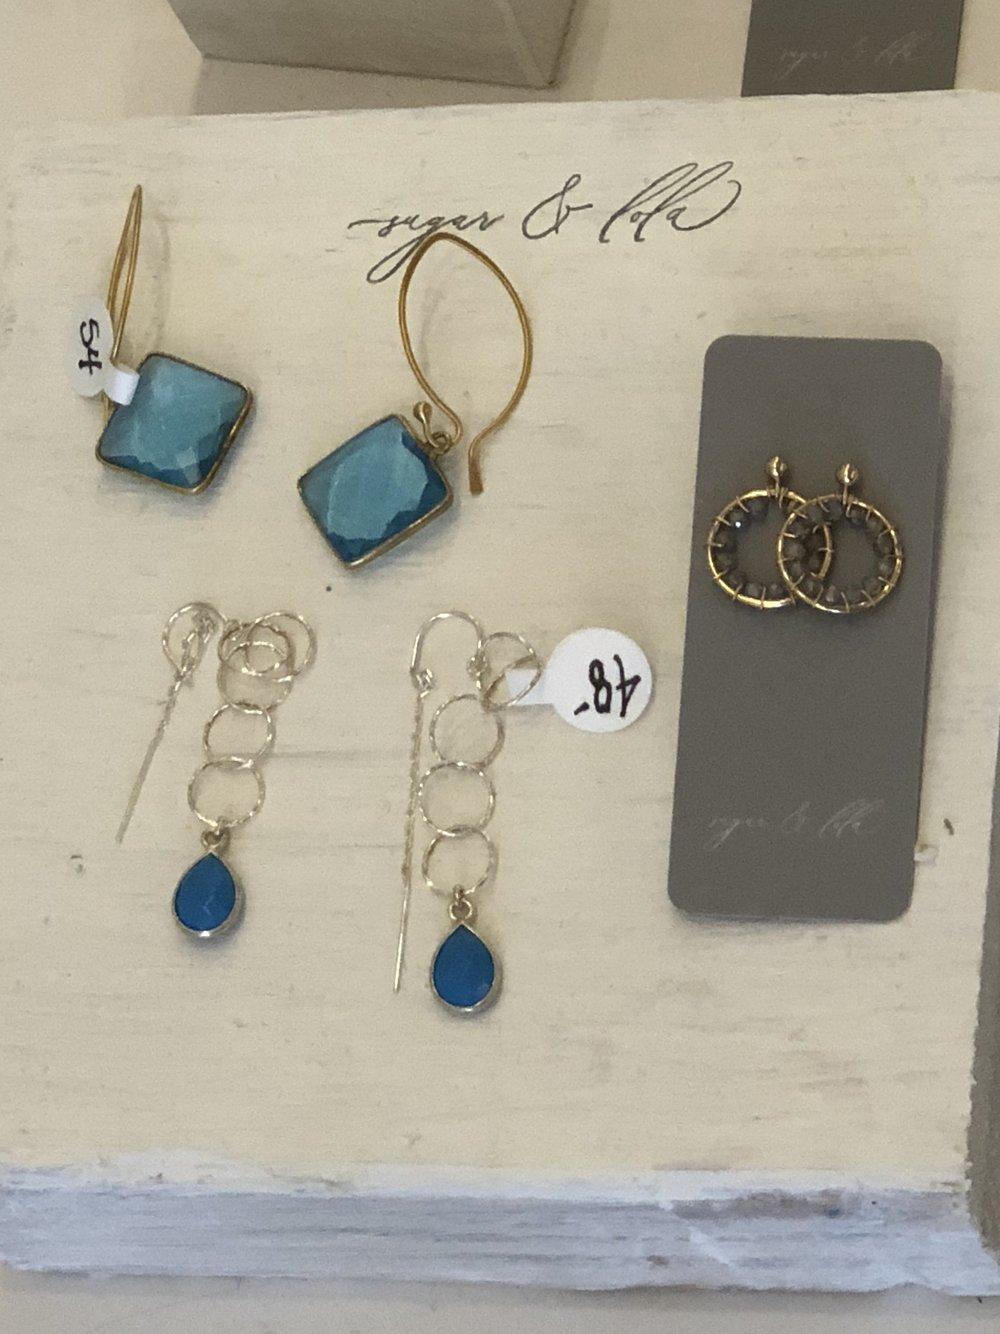 Jewelry by Sugar & Lola